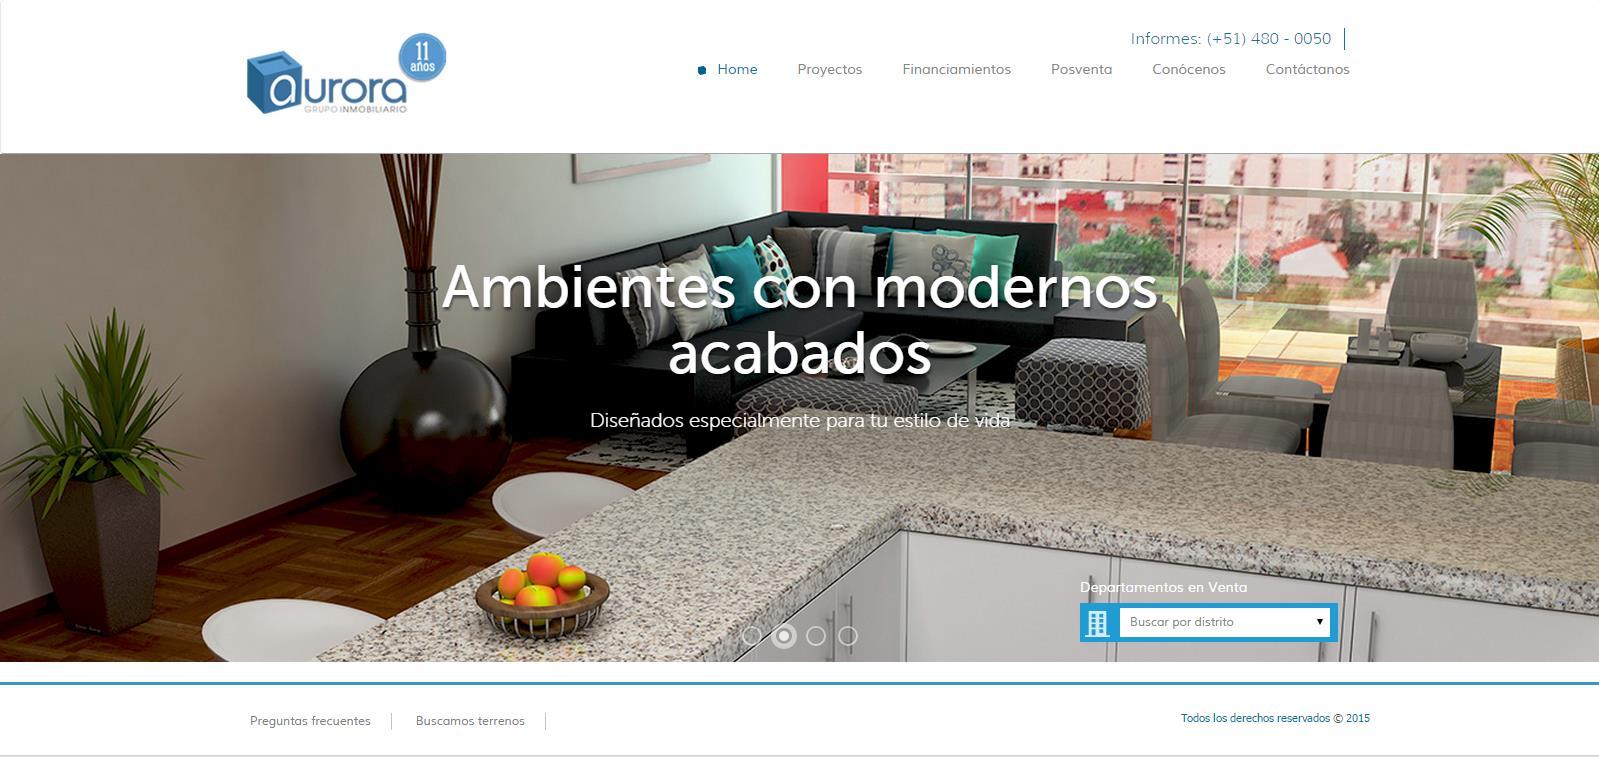 marketing-digital1